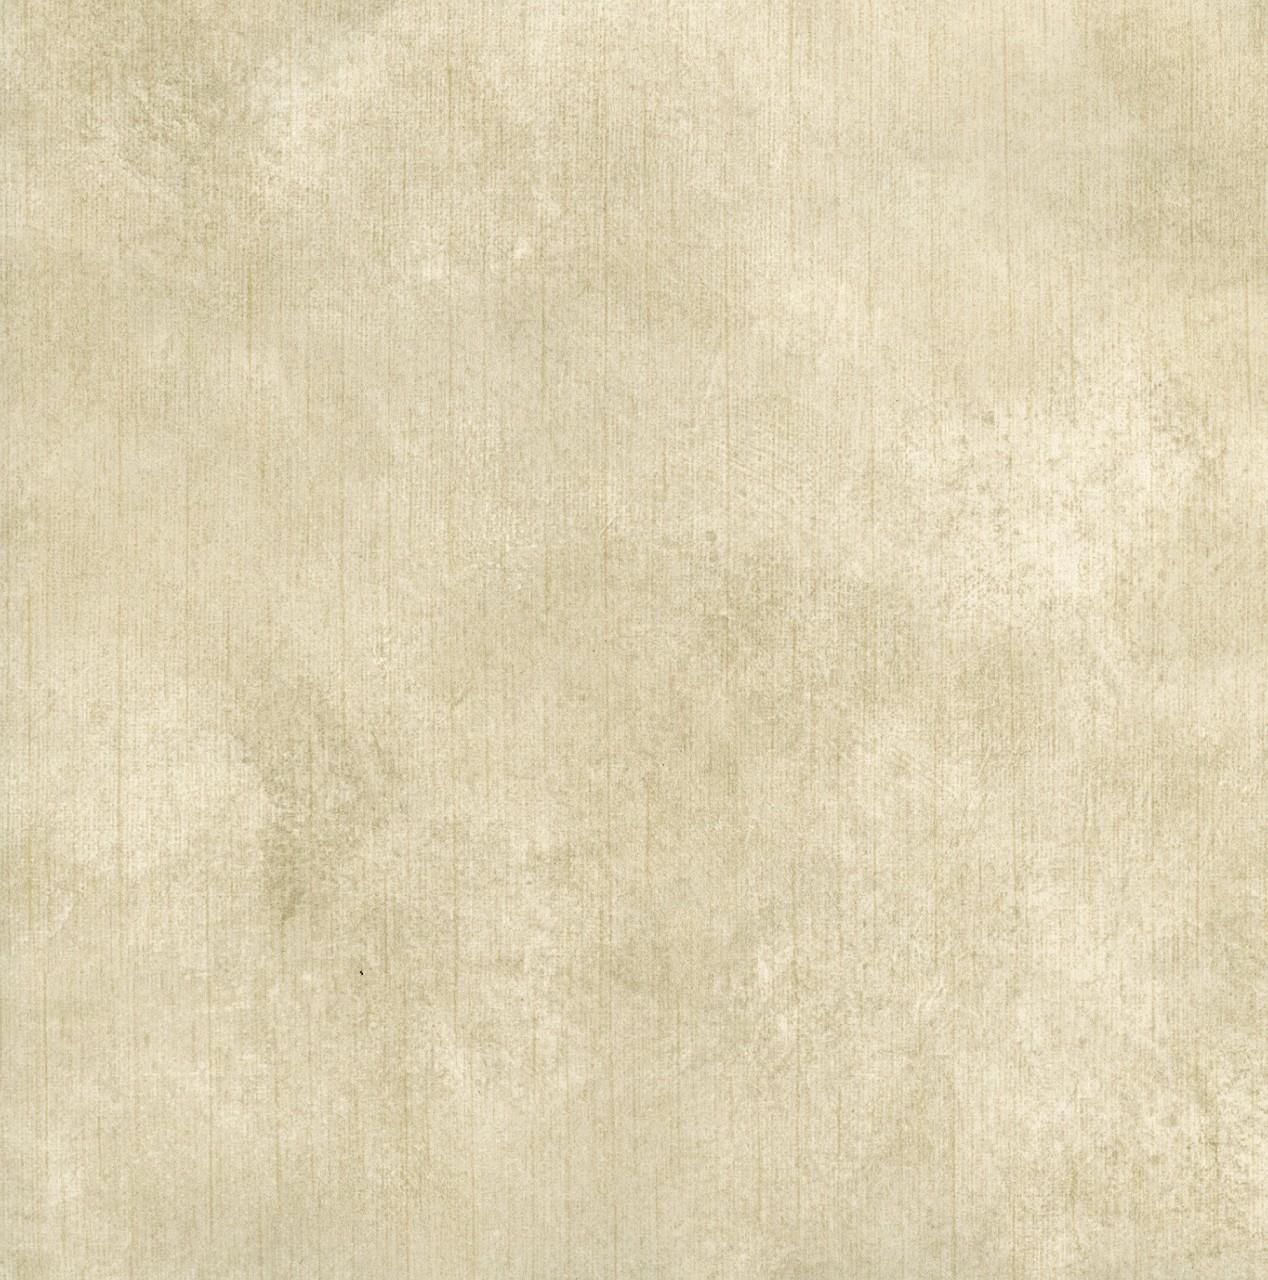 Beige Cream MLV34094 Jenney Texture Wallpaper   Contemporary 1268x1280